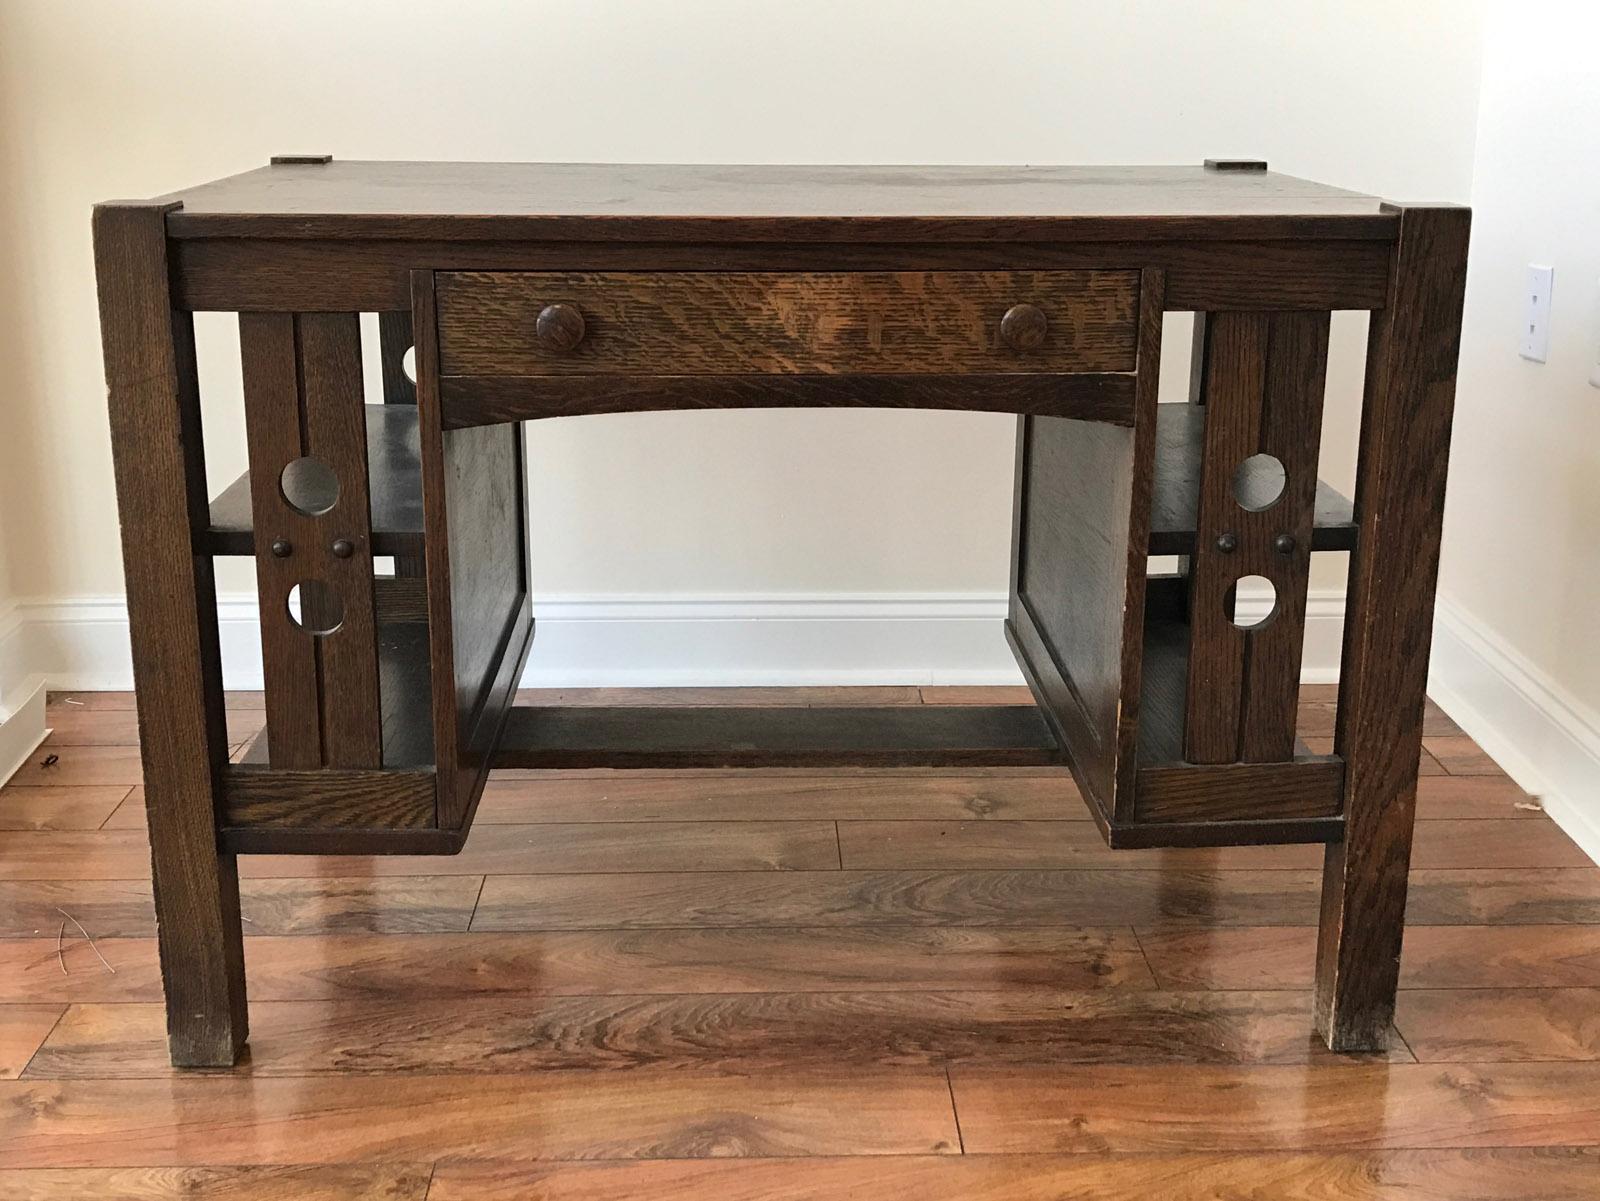 Arts crafts desk - Image Of Antique Mission Oak Arts And Crafts Library Desk With Shelves